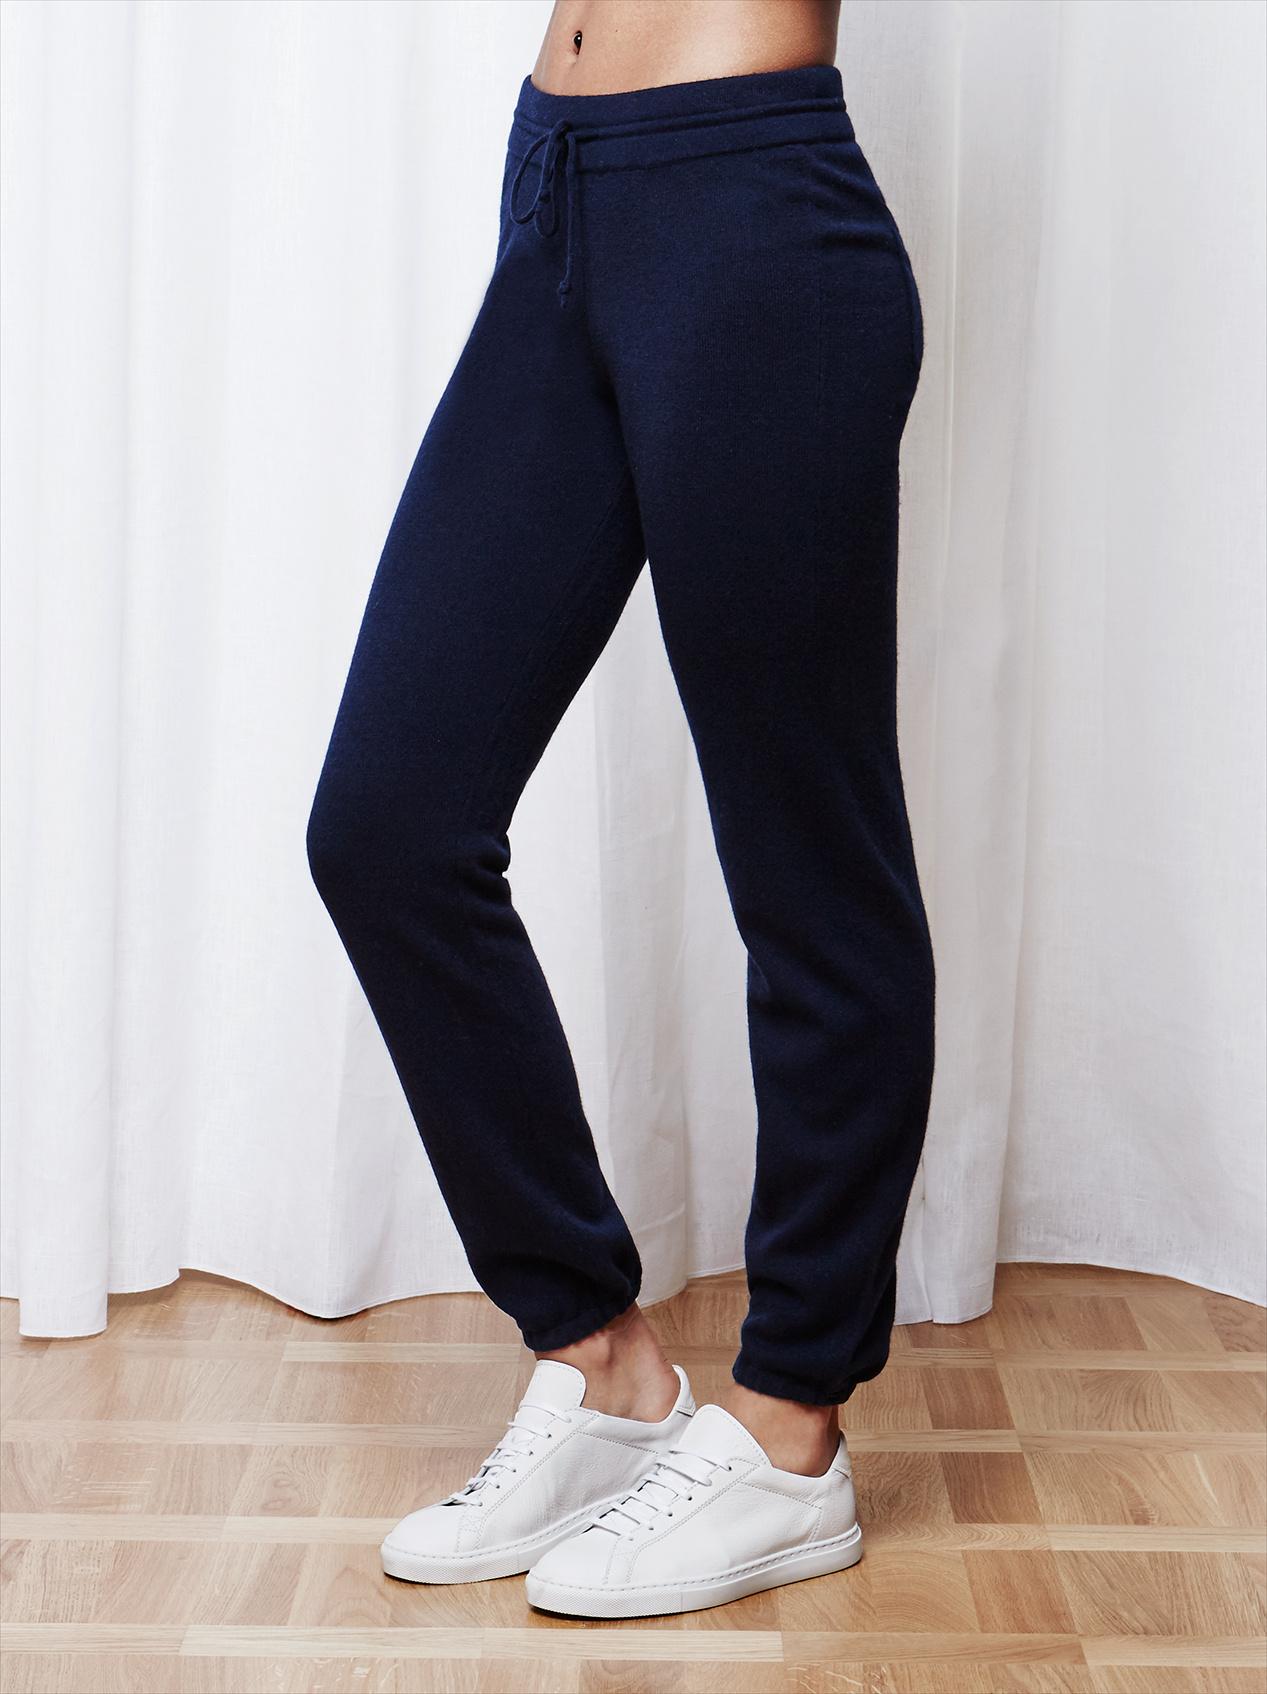 Soft Goat Women's Pants Navy